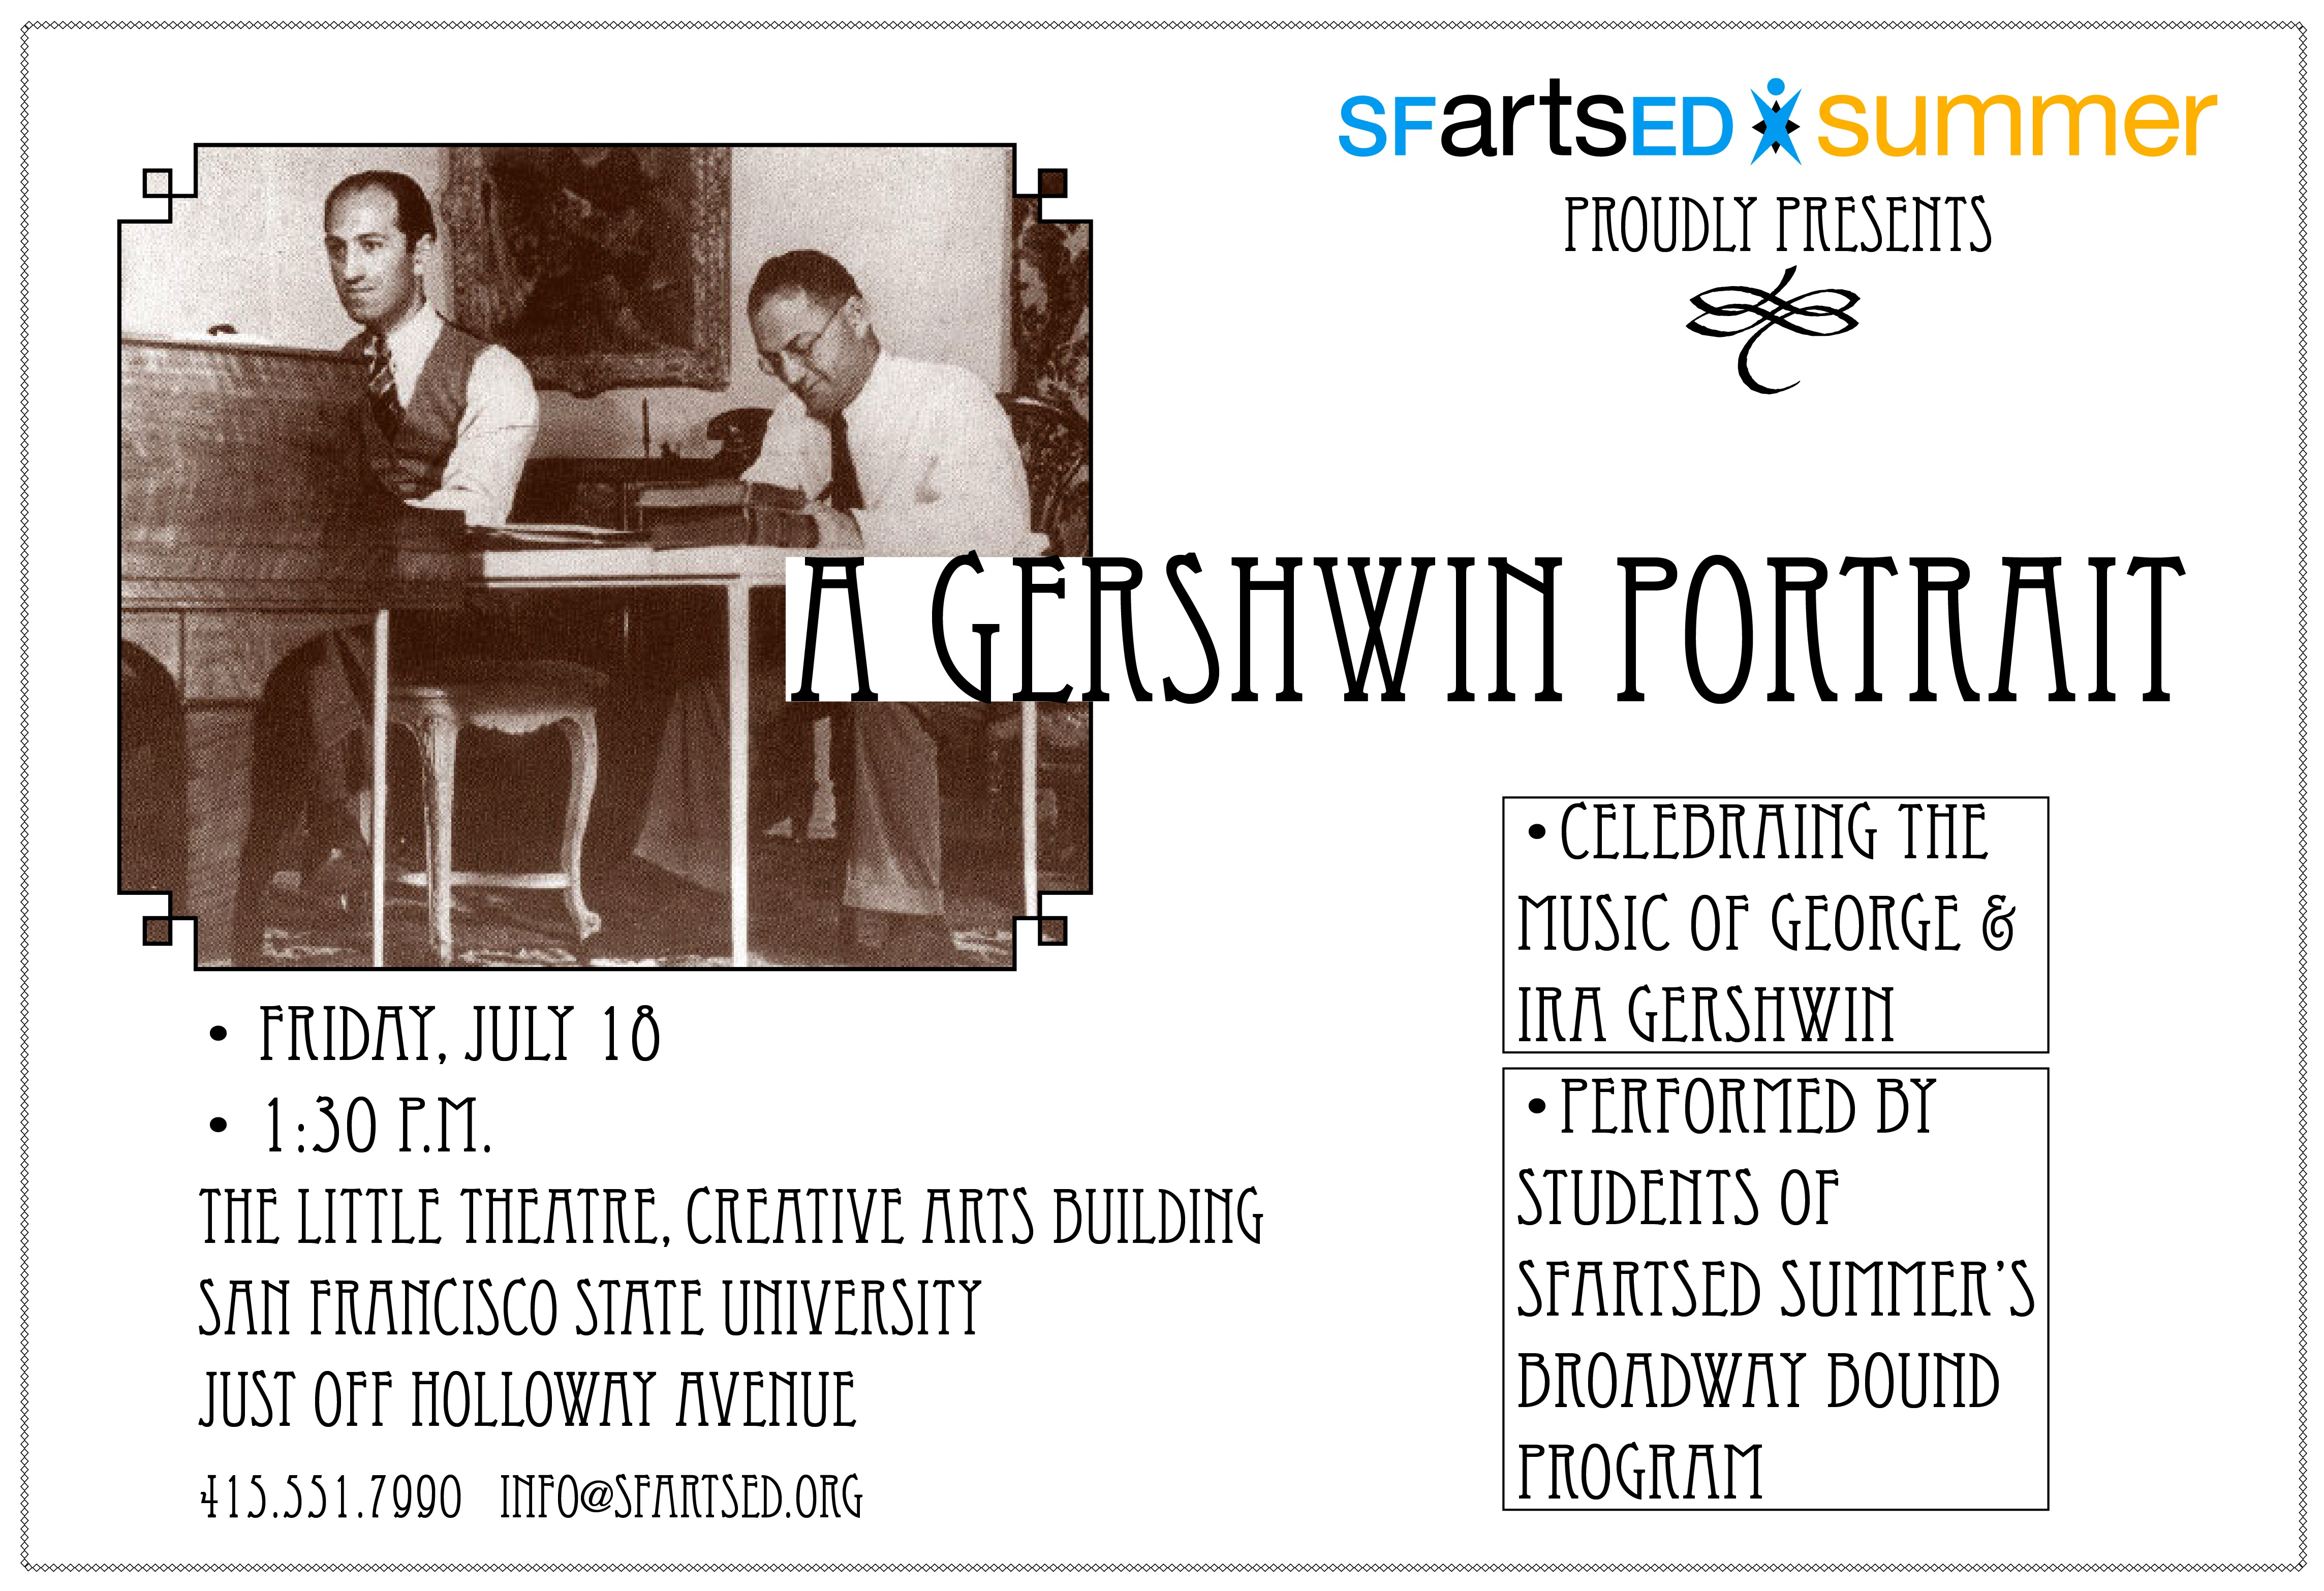 Broadway Bound students perform A Gershwin Portrait